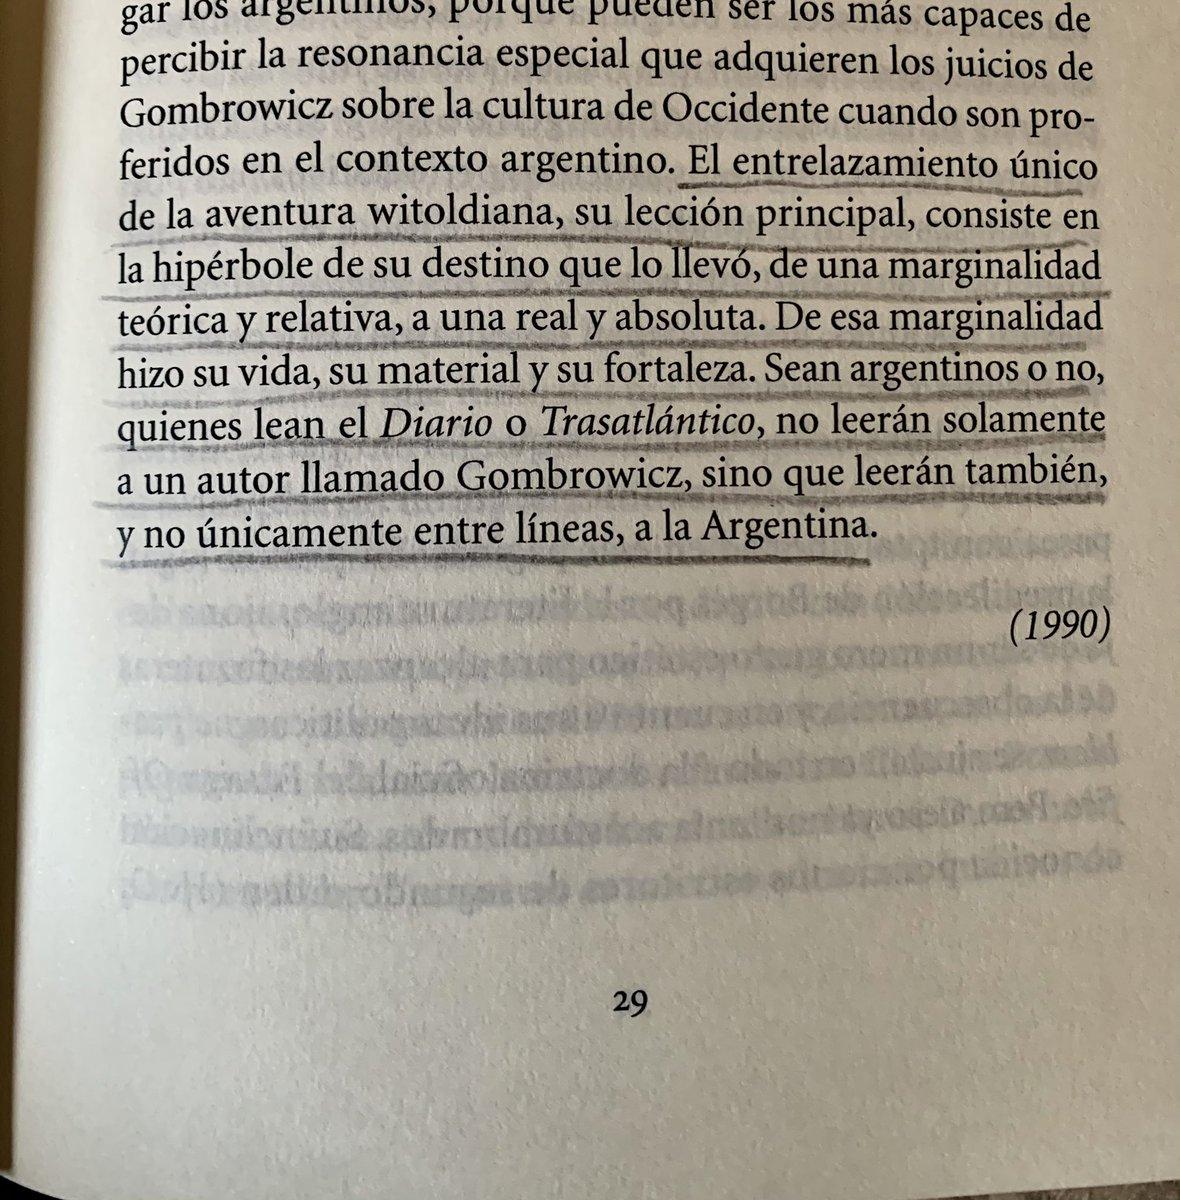 #JuanJoseSaer sobre #Gombrowicz